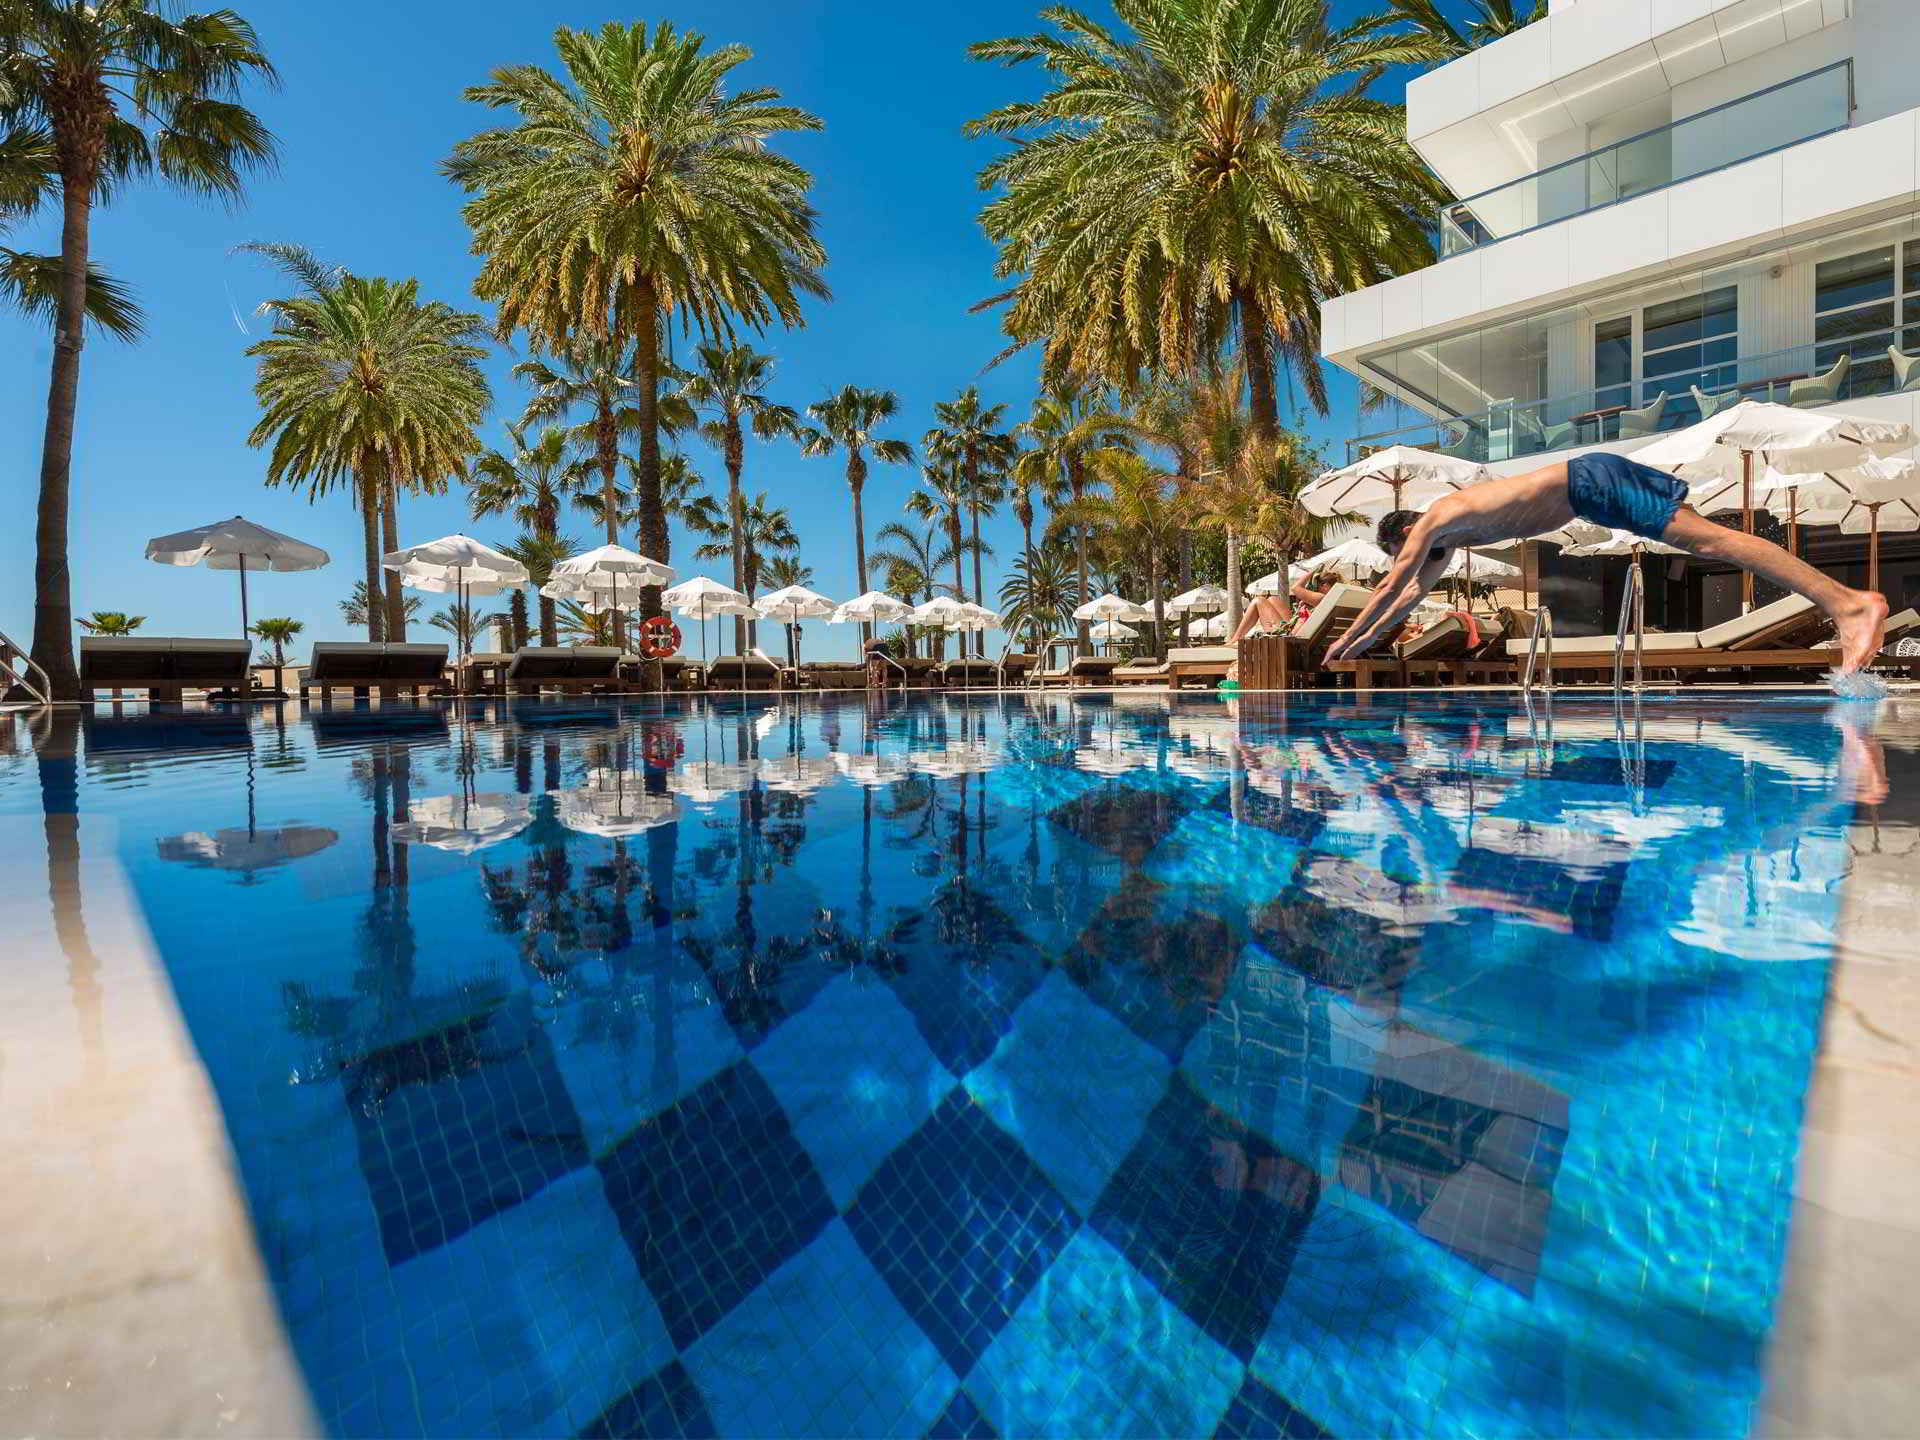 Amare marbella beach hotel adults only hotel marbella